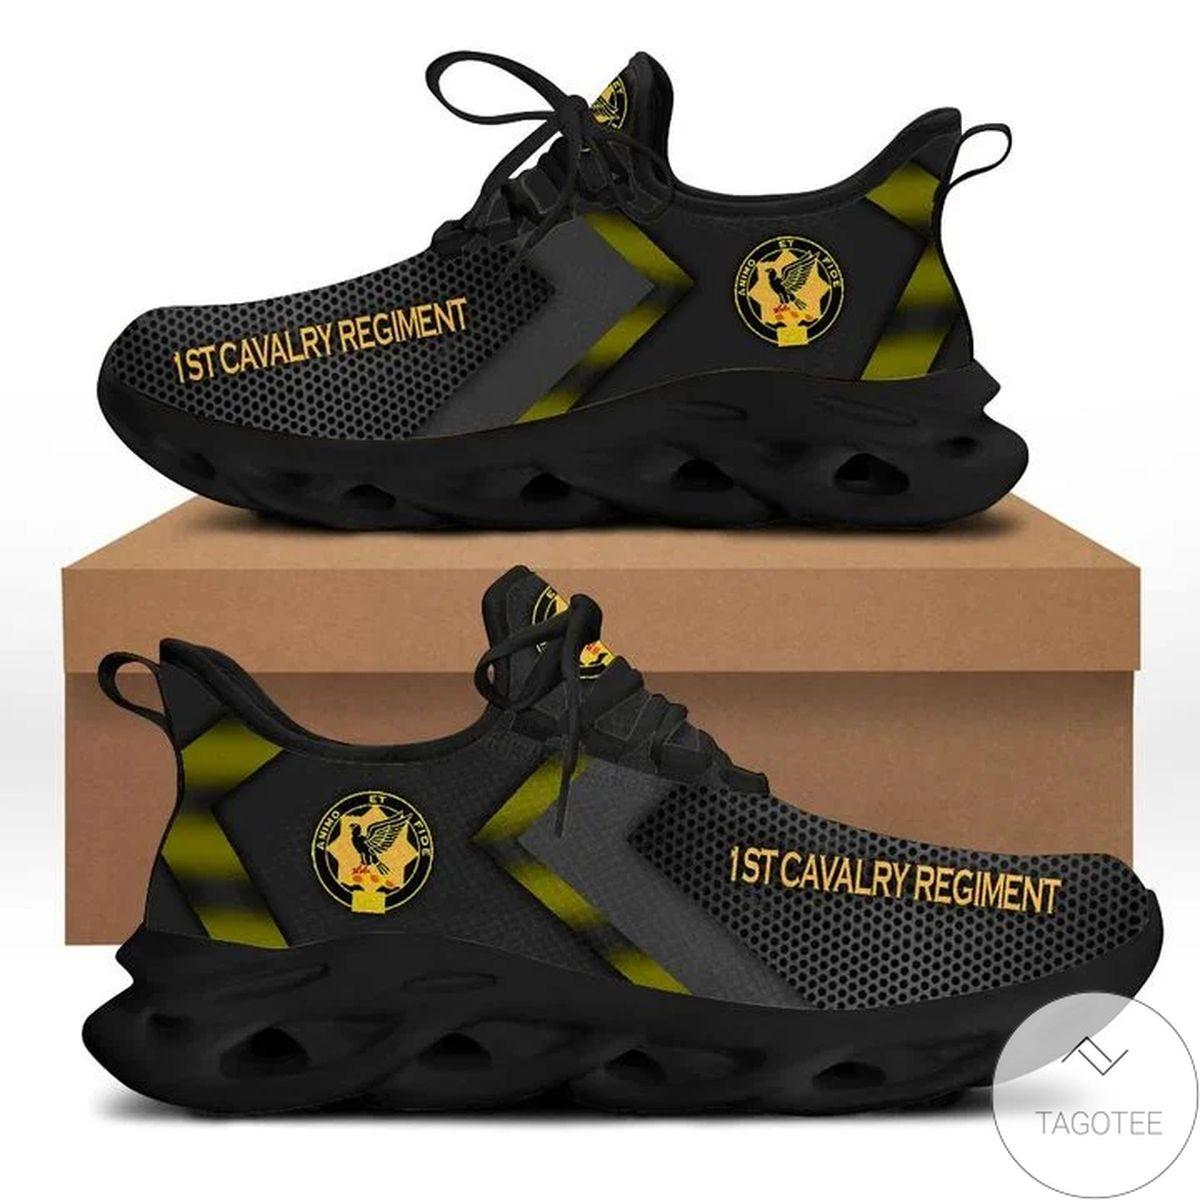 Free Ship 1st Cavalry Regiment Max Soul Shoes